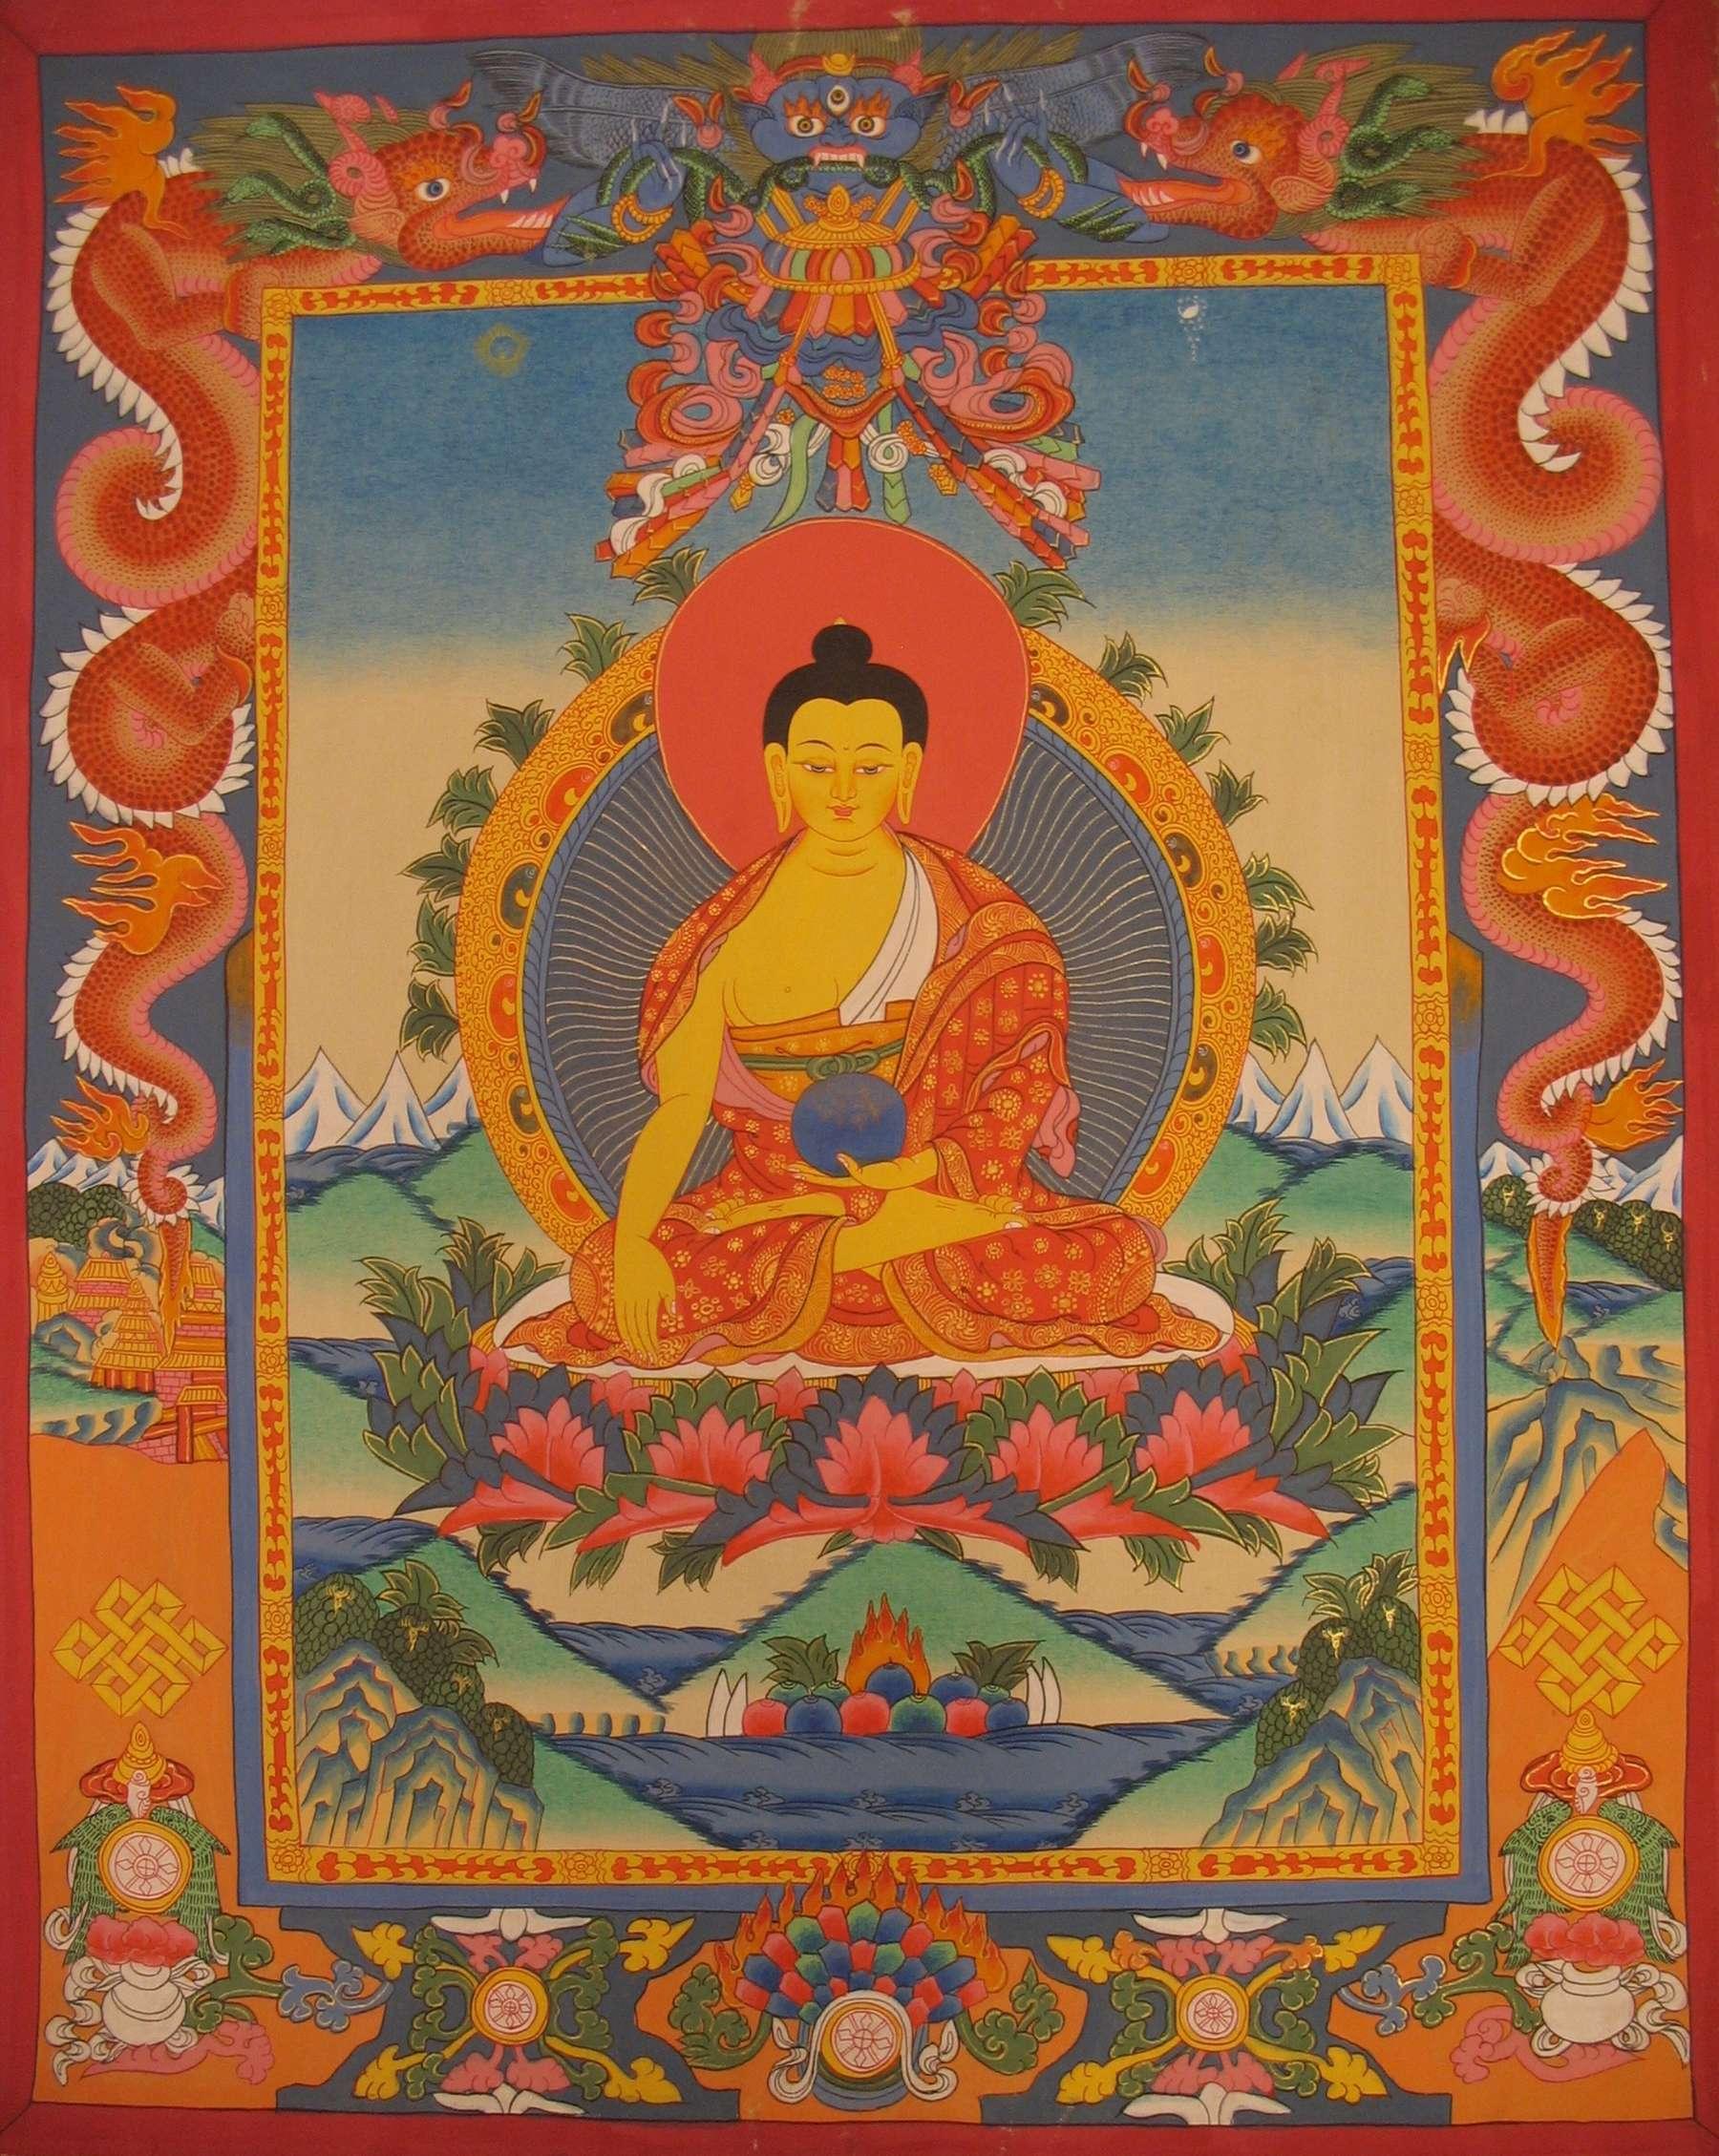 Shakyamuni Buddha Thangka with Dragon